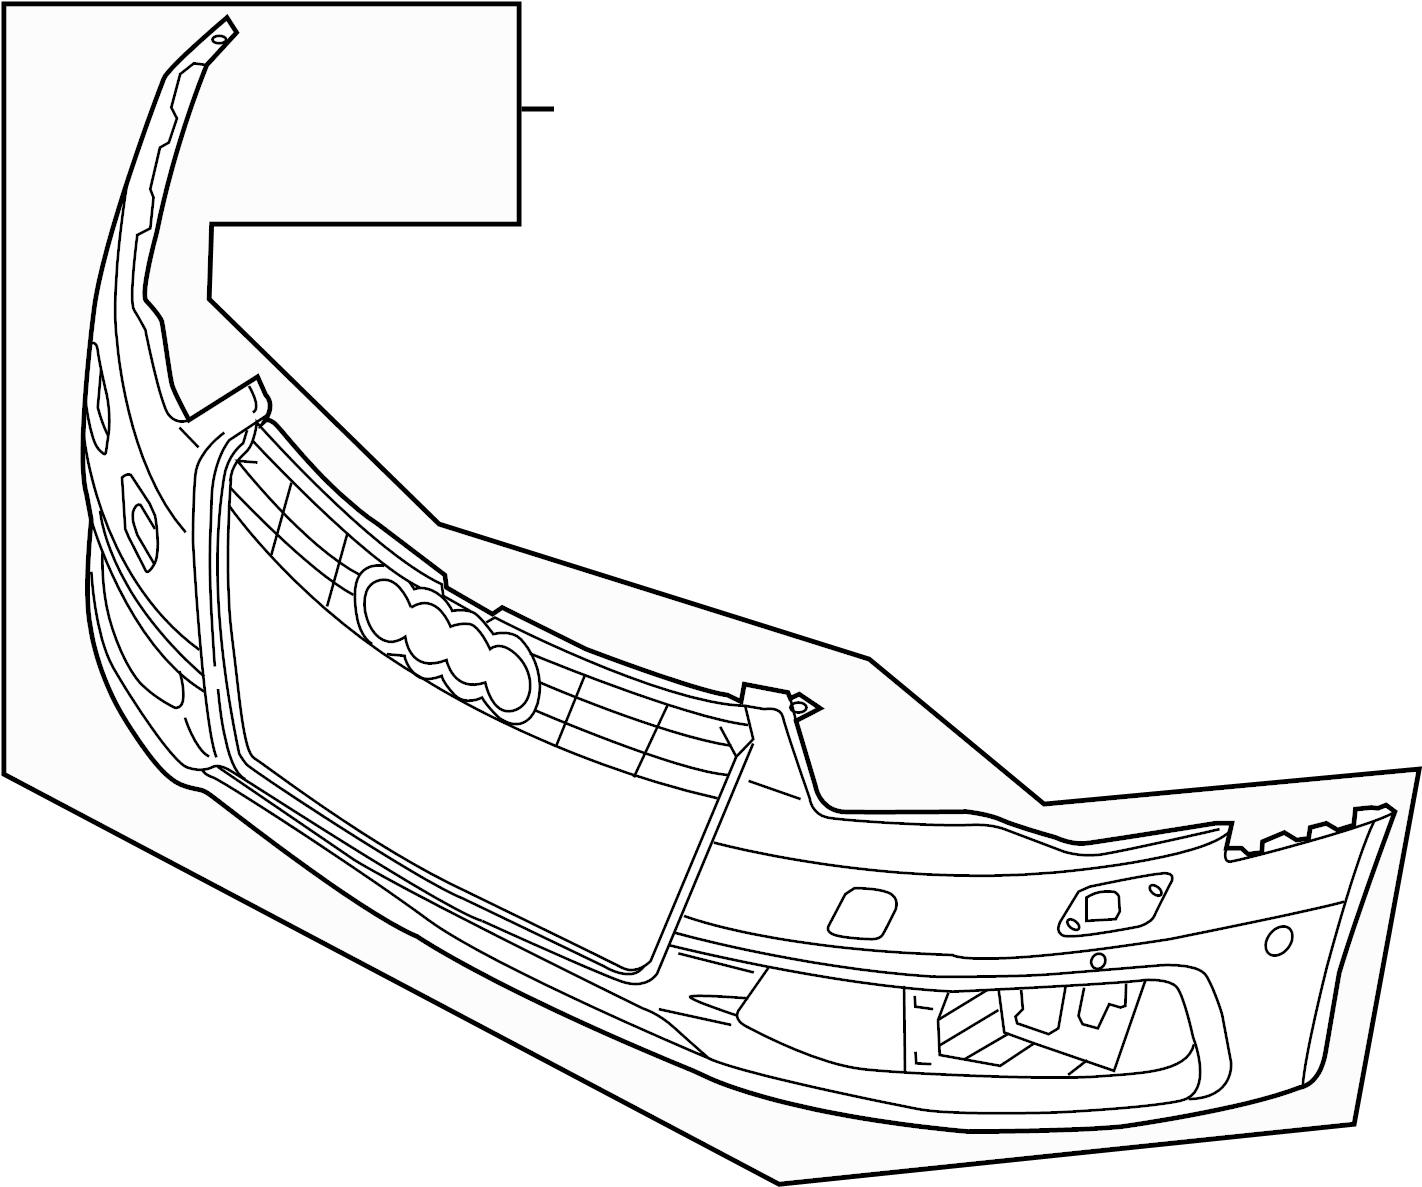 Audi A6 Primed